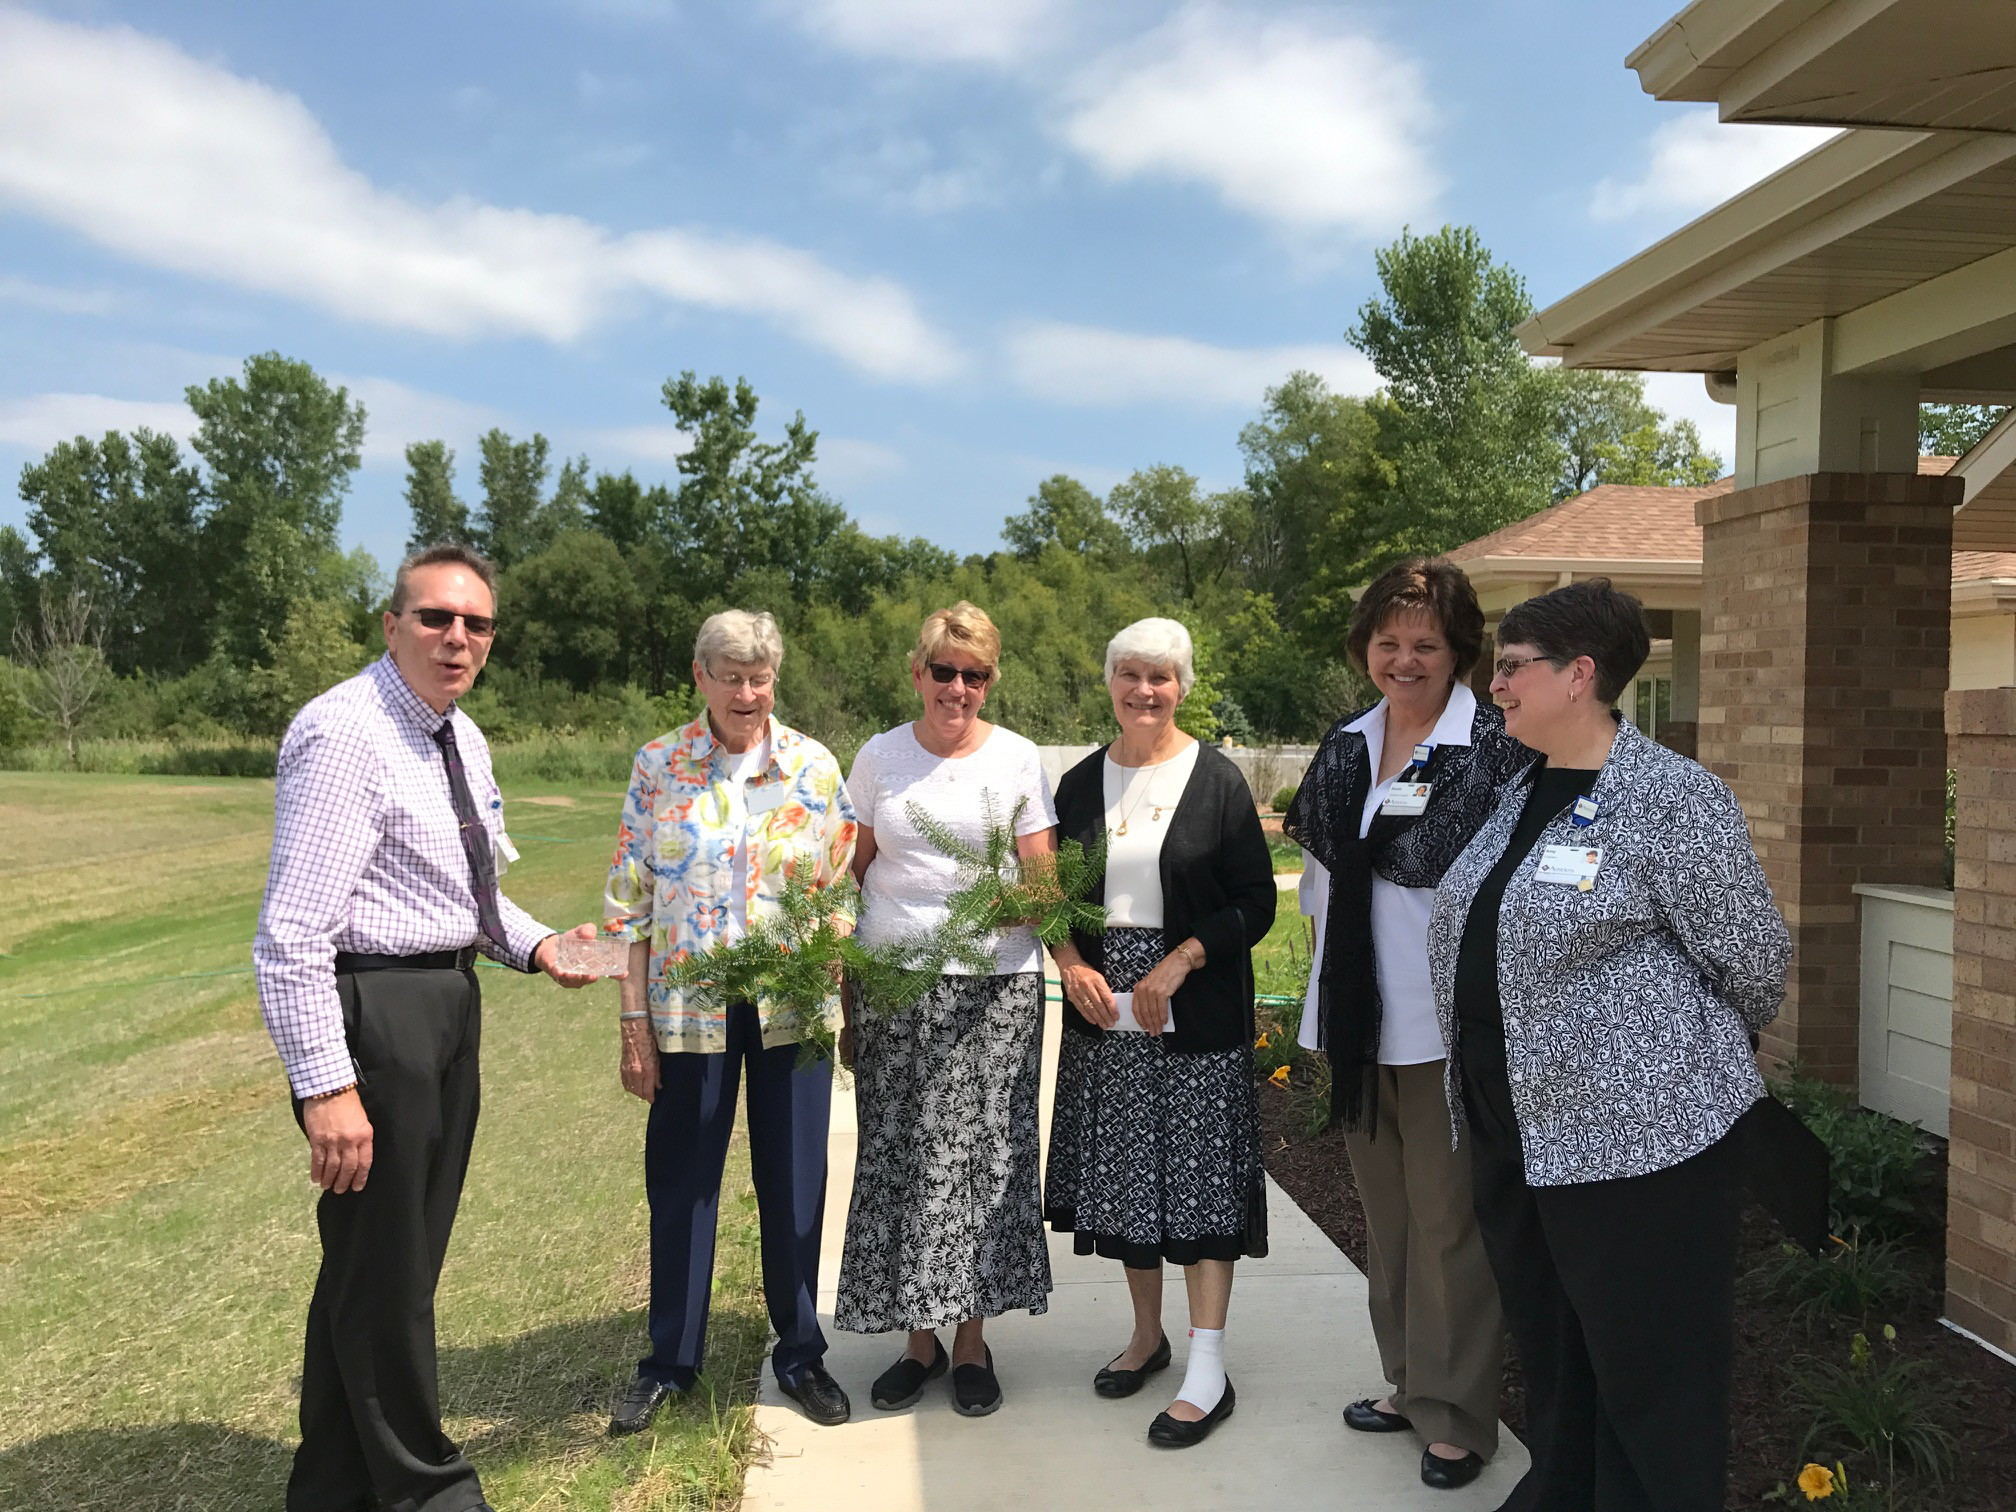 Blessing of Hospice Home of Hope addition, 2017.  Left to right:  Michael Schaefer, Sister Anne Jude Van Lanen, Char Bohnsack, RN, Sister Jean Steffes, Karen Kraus, and Sister Amy Golms.